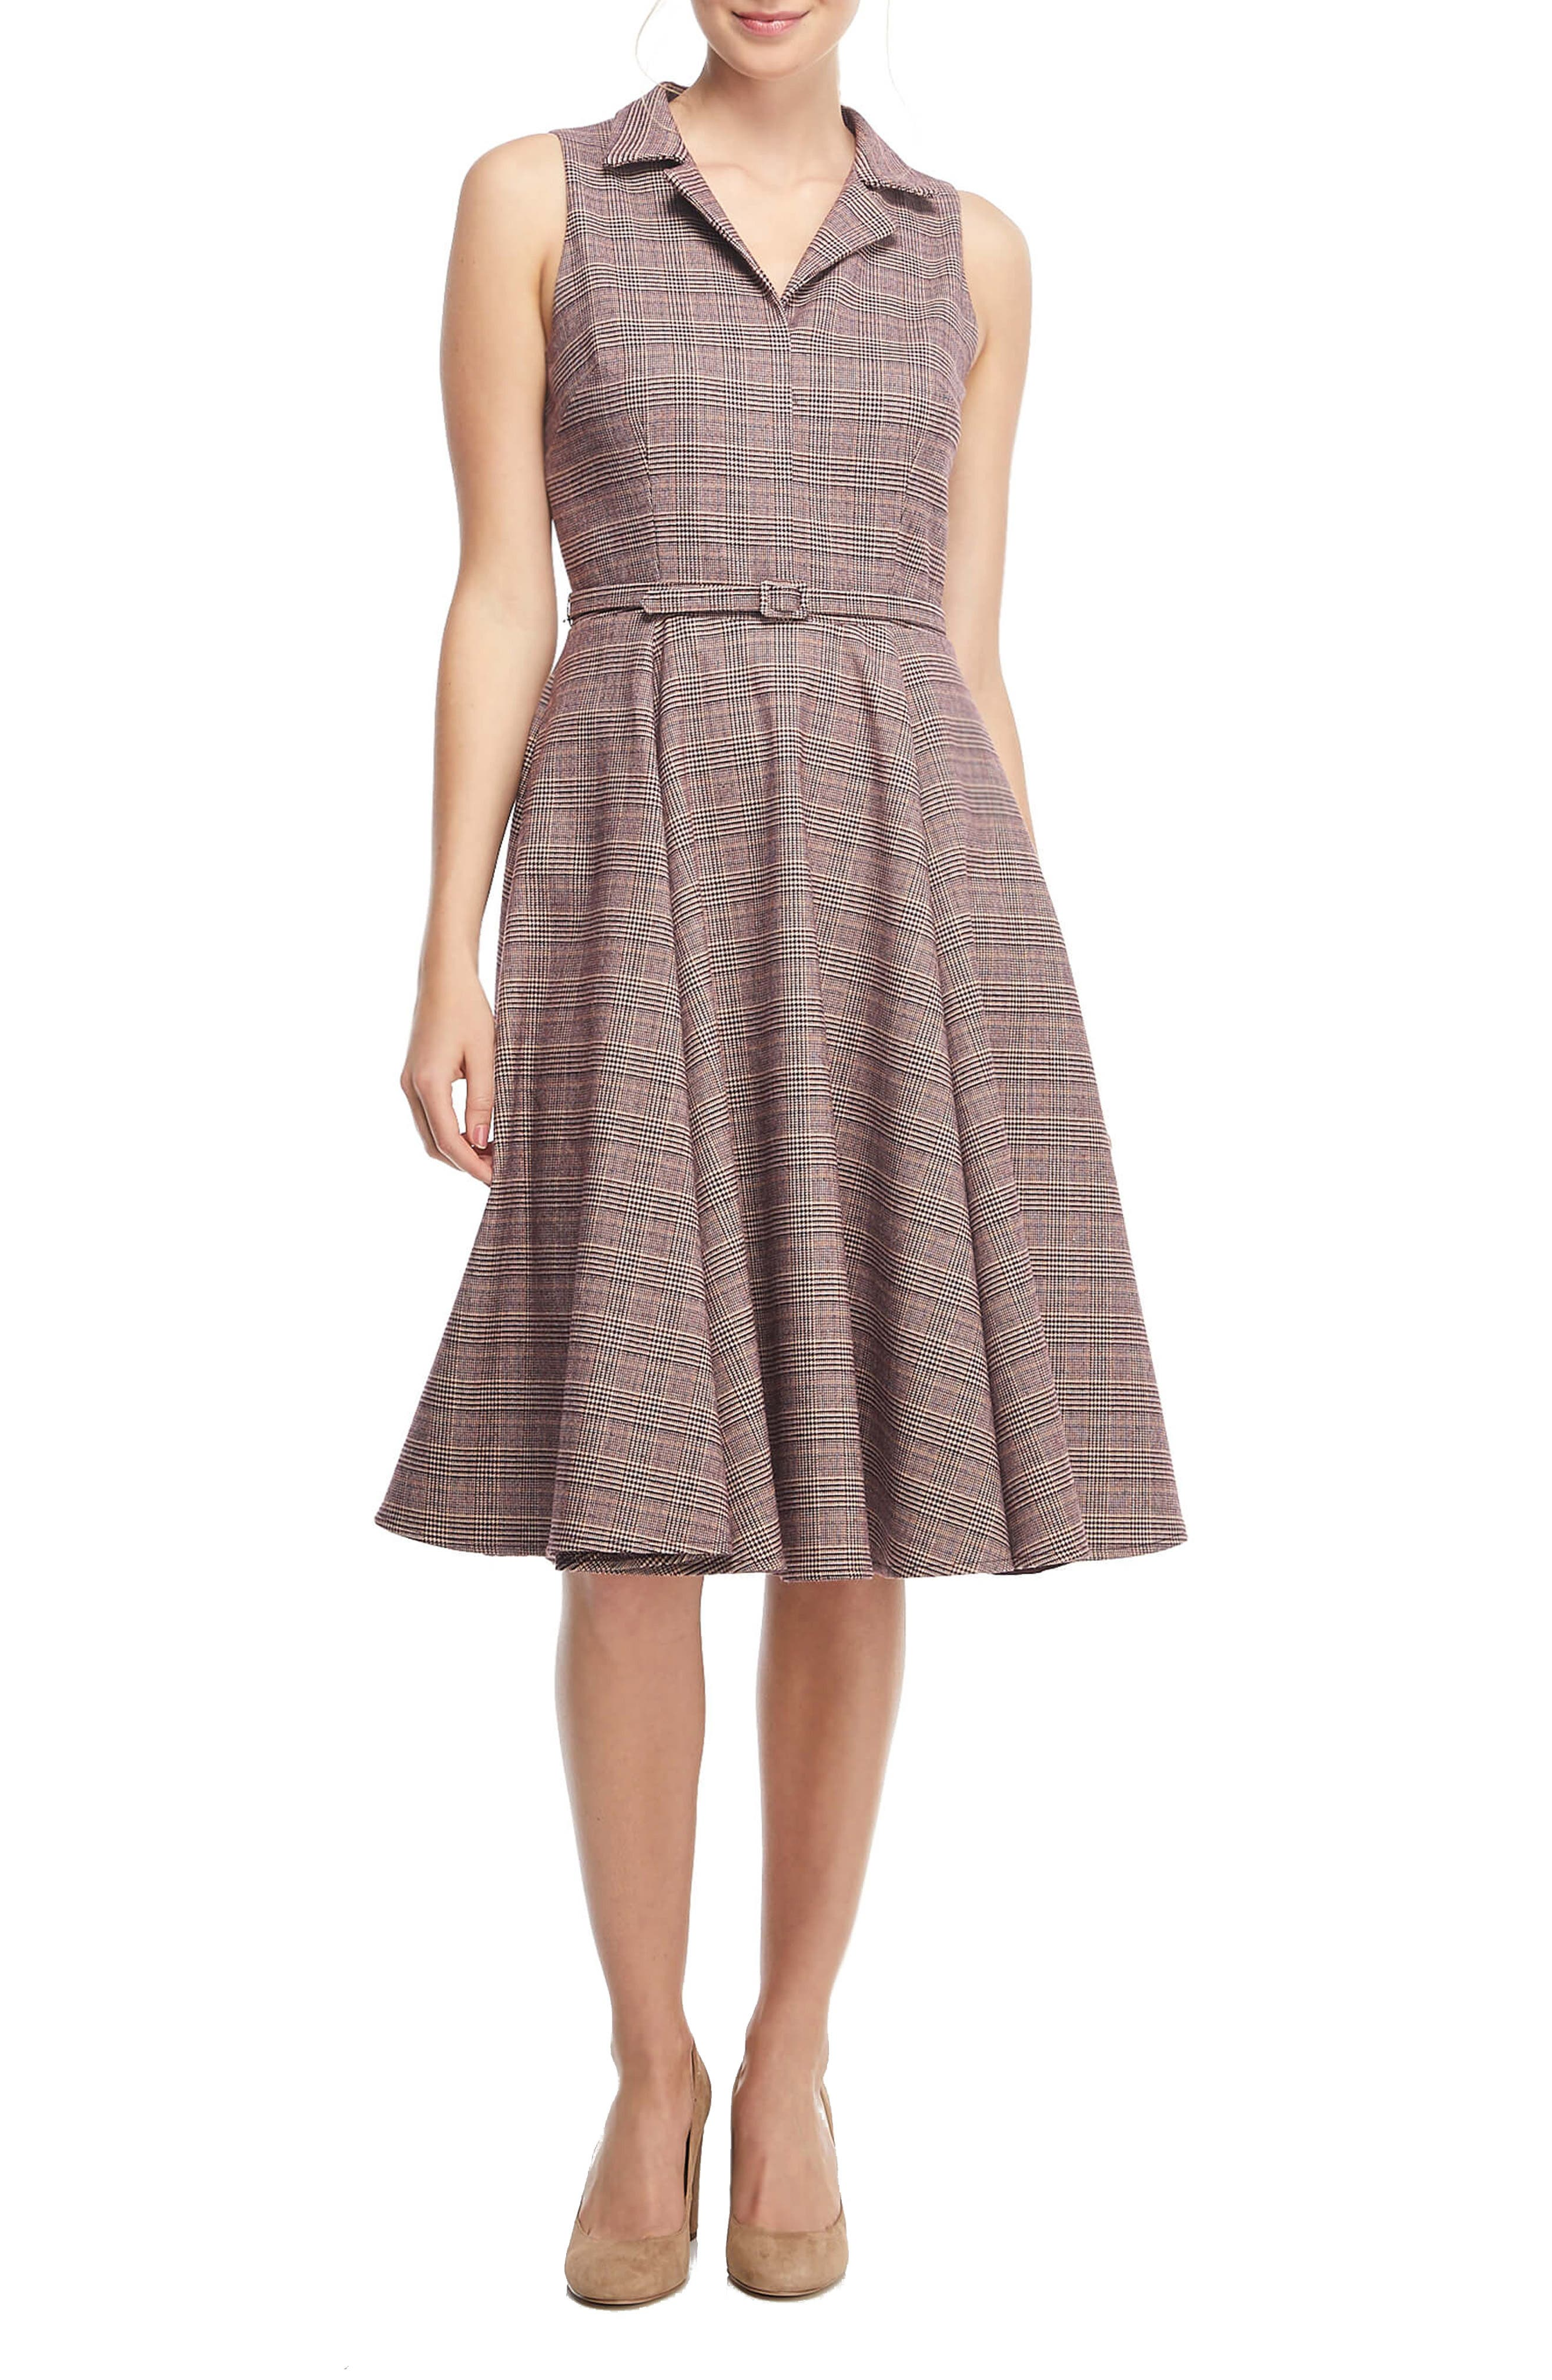 Plus Size Swing Dresses, Vintage Dresses Womens Gal Meets Glam Collection Rita Menswear Plaid Fit  Flare Shirtdress $131.98 AT vintagedancer.com